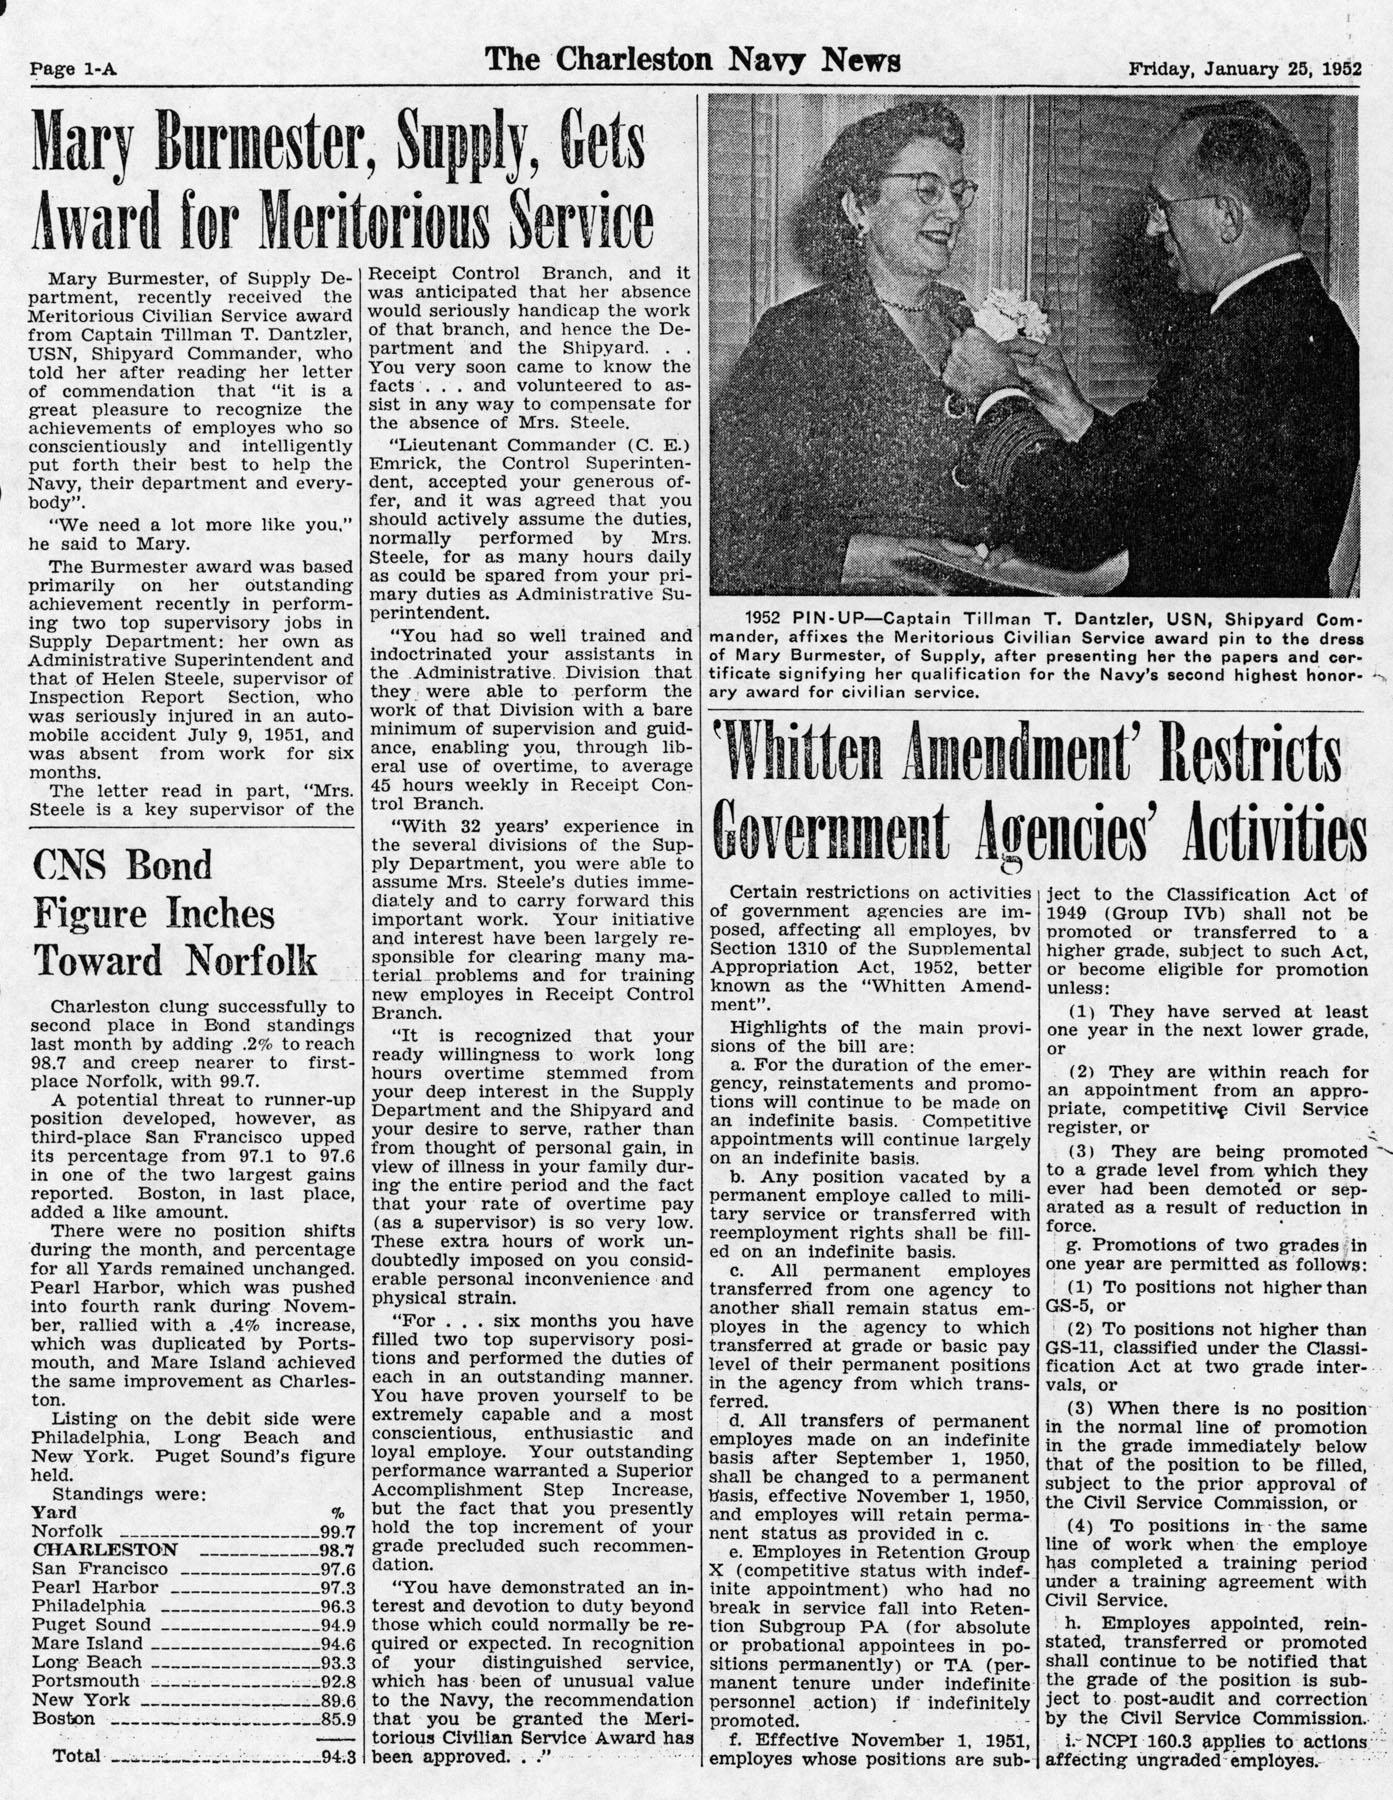 The Charleston Navy News, Volume 10, Edition 13, page ia